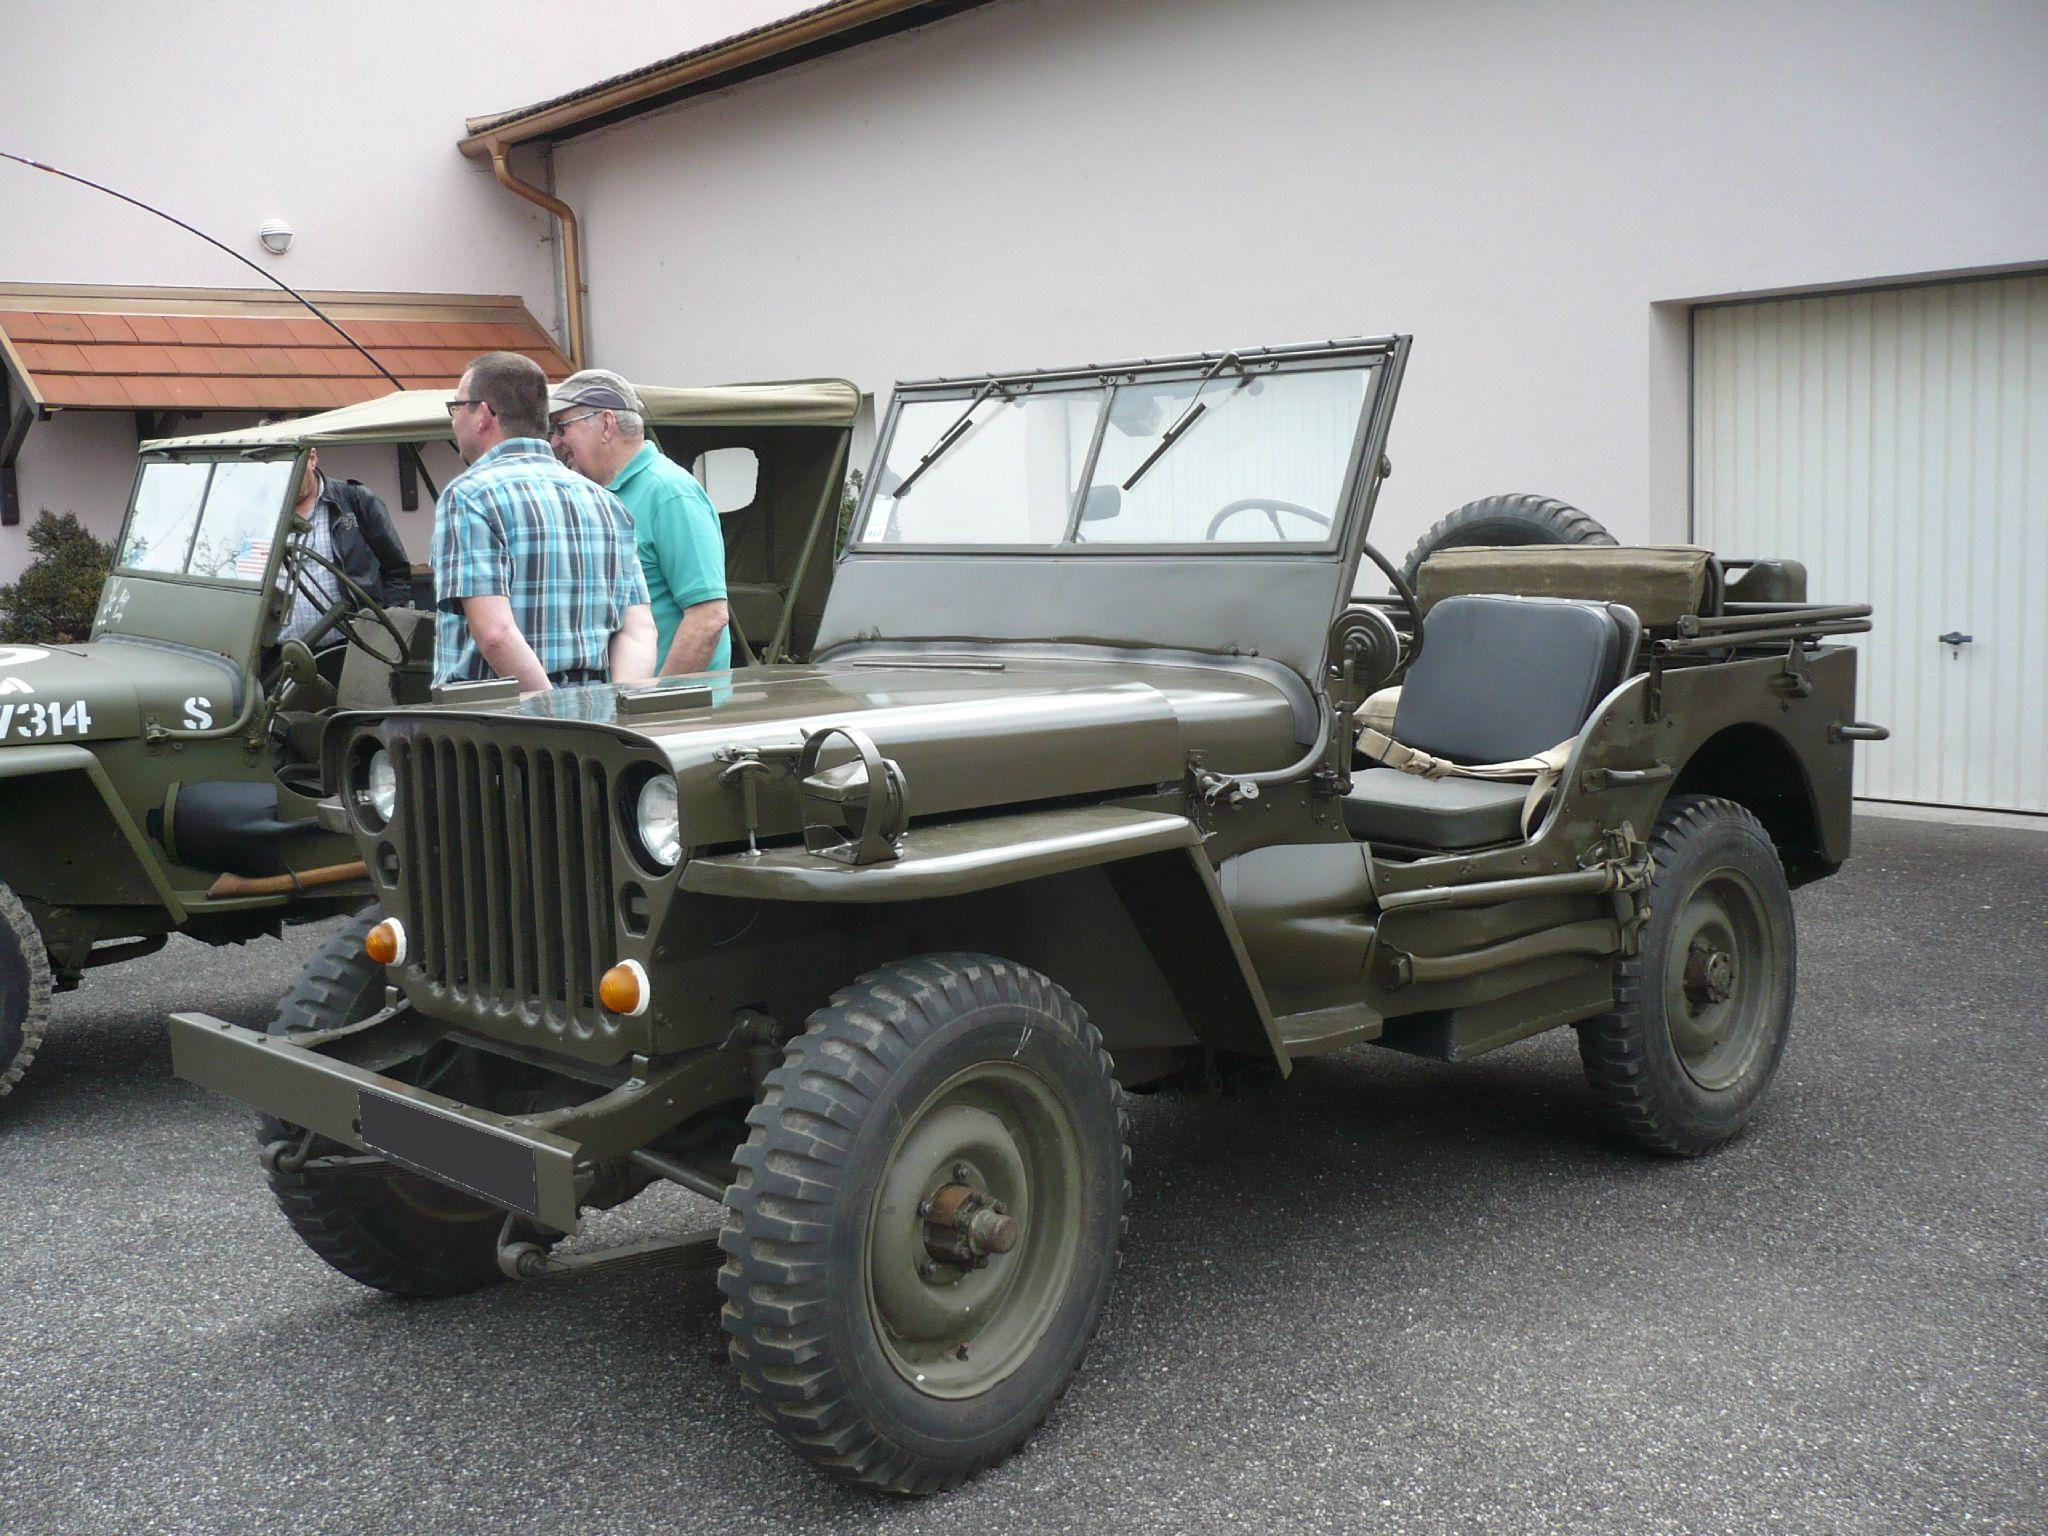 hotchkiss jeep m201 voiture de liaison vroom vroom. Black Bedroom Furniture Sets. Home Design Ideas